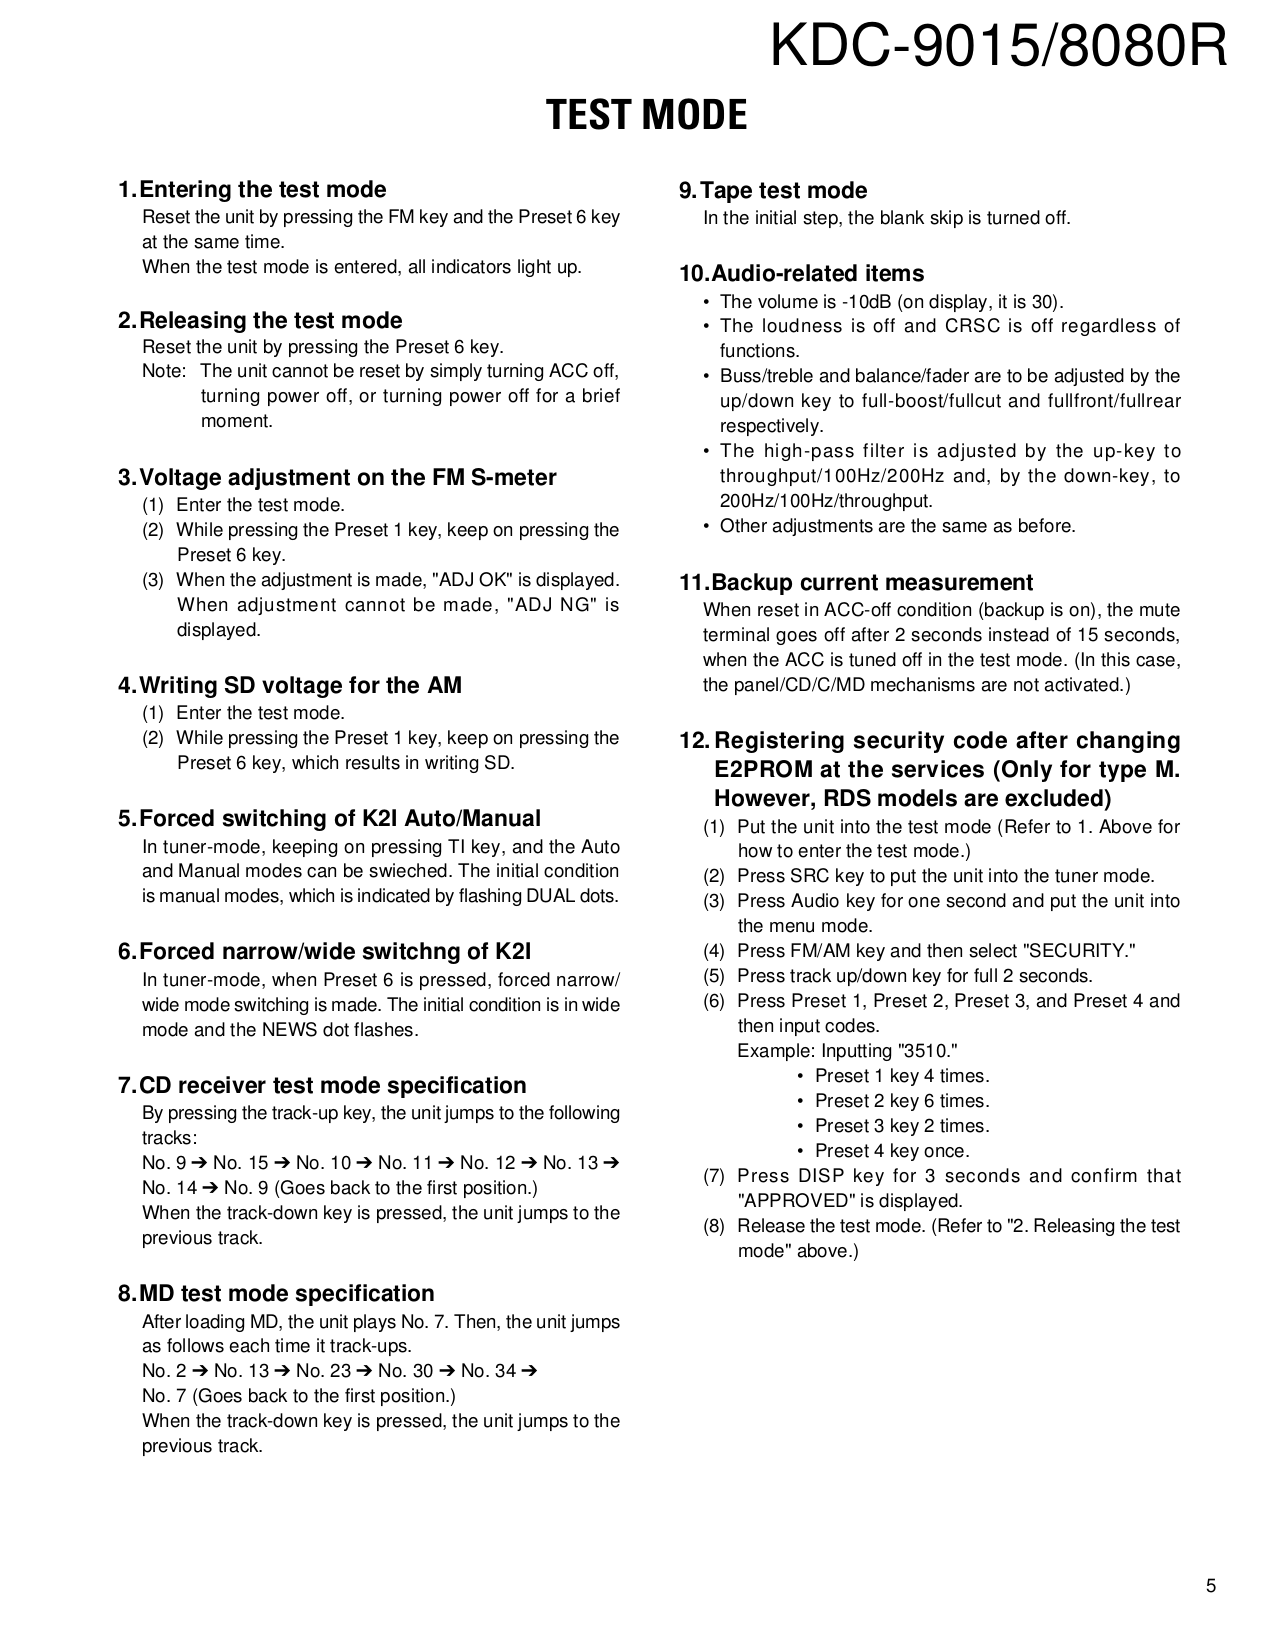 PDF manual for Kenwood Car Receiver KDC-9015